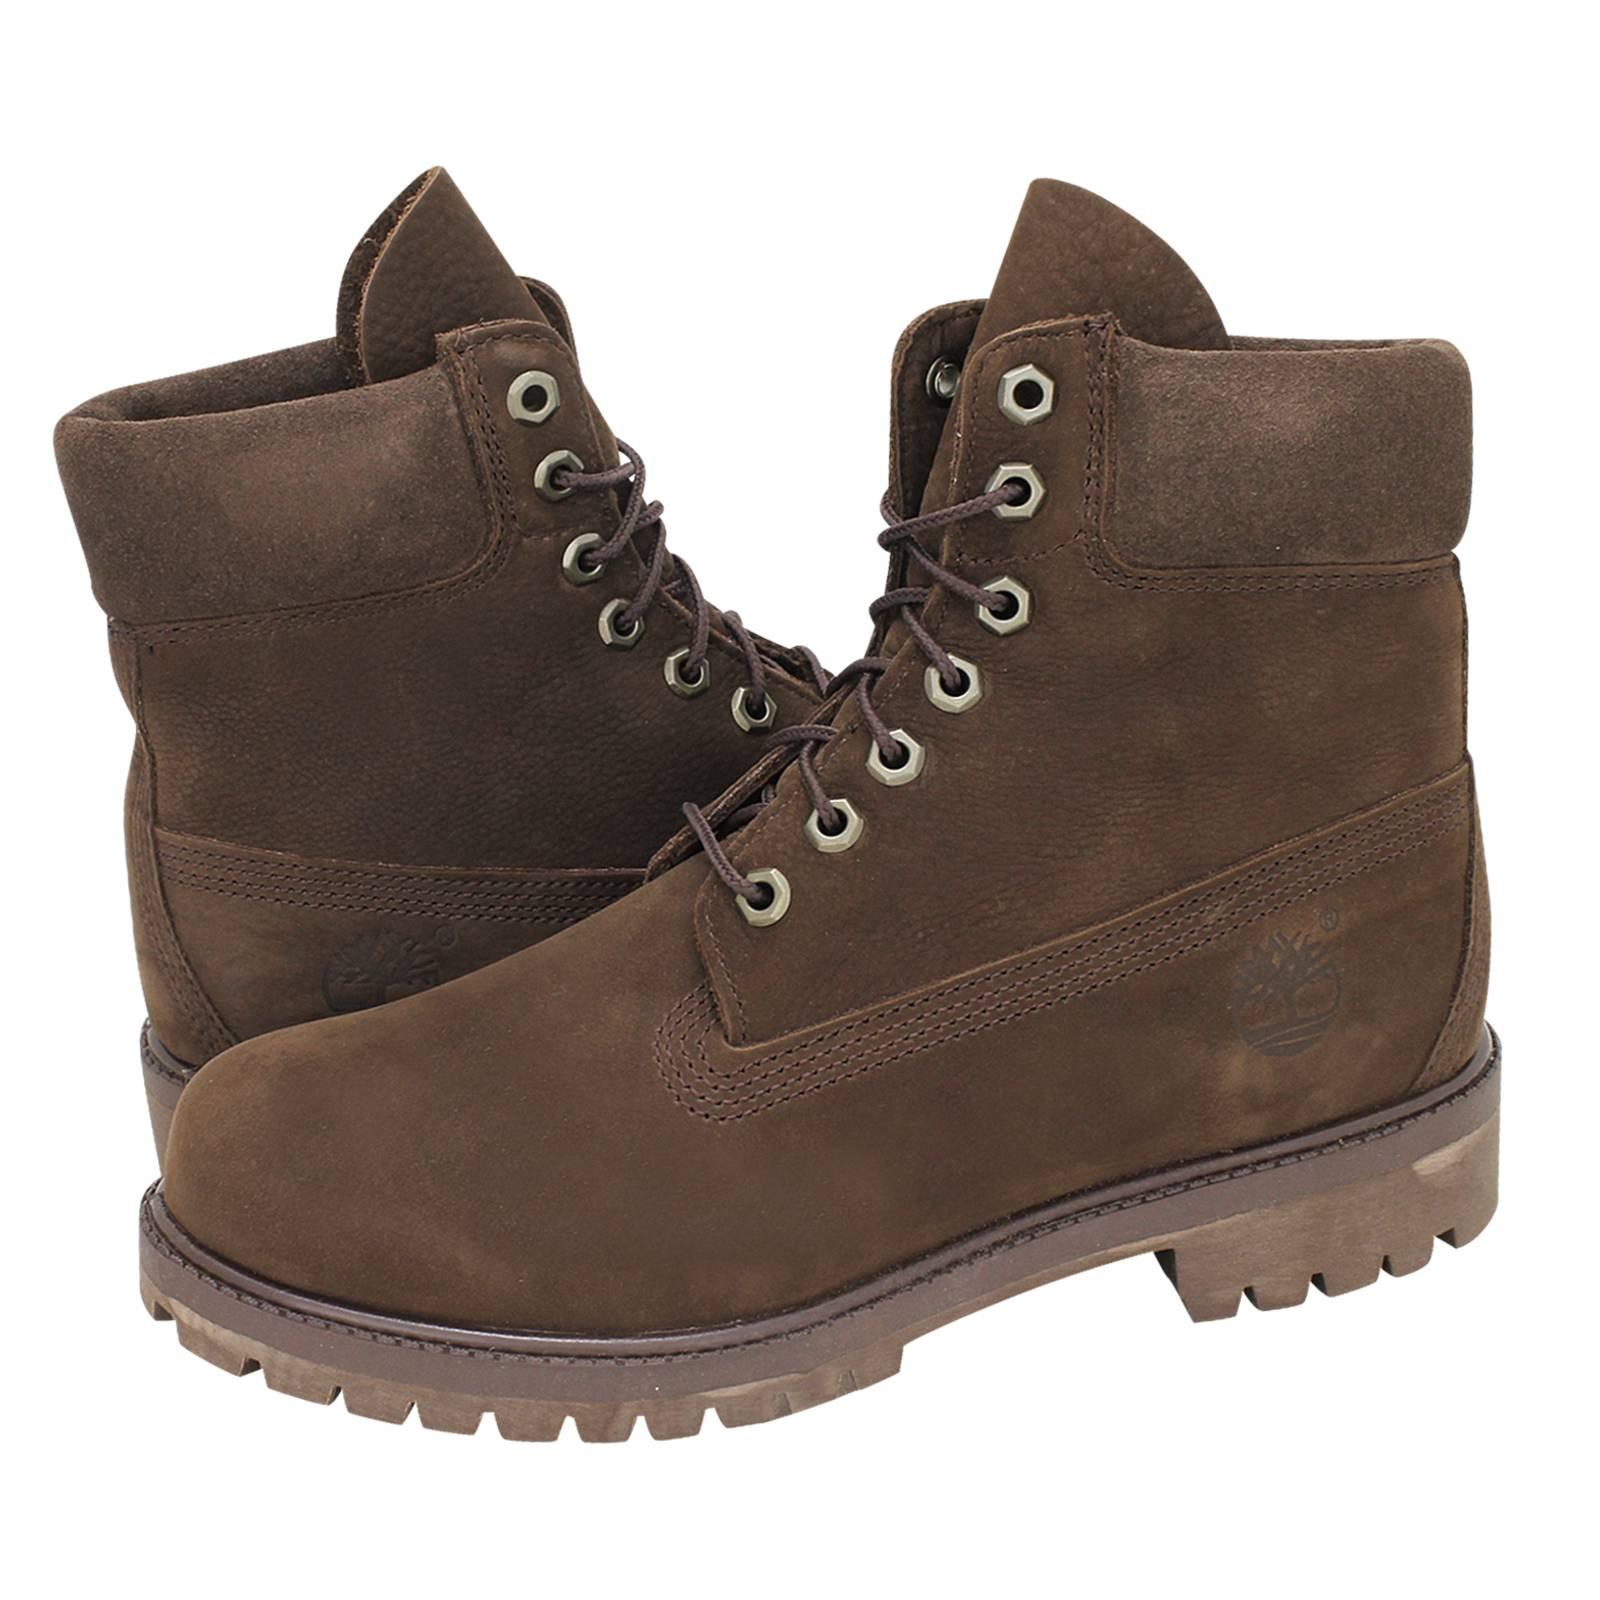 Icon 6 Premium Boot - Ανδρικά μποτάκια Timberland από nubuck και ... 881a18425bb